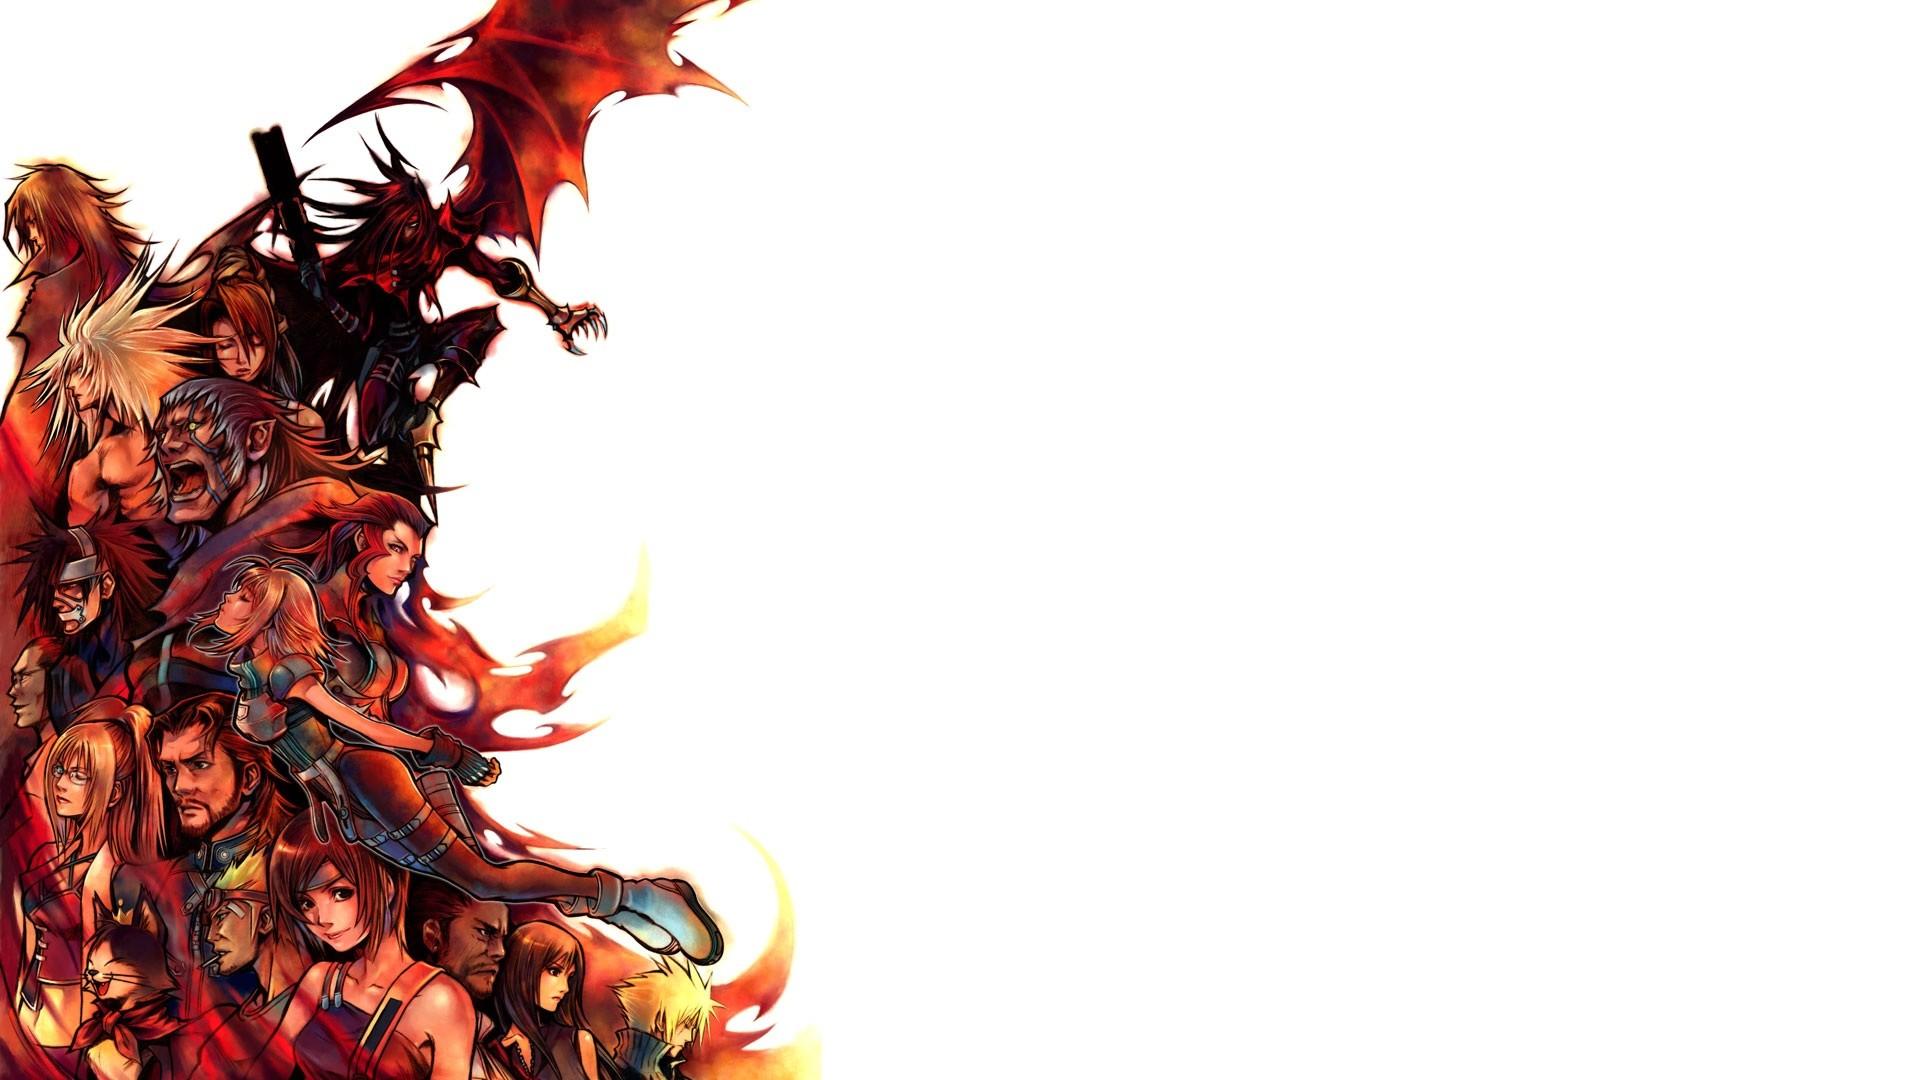 Res: 1920x1080, Final Fantasy White Cloud Strife Tifa Lockheart Barret Wallace Yuffie  Kisaragi Cid Cait Sith Vincent HD